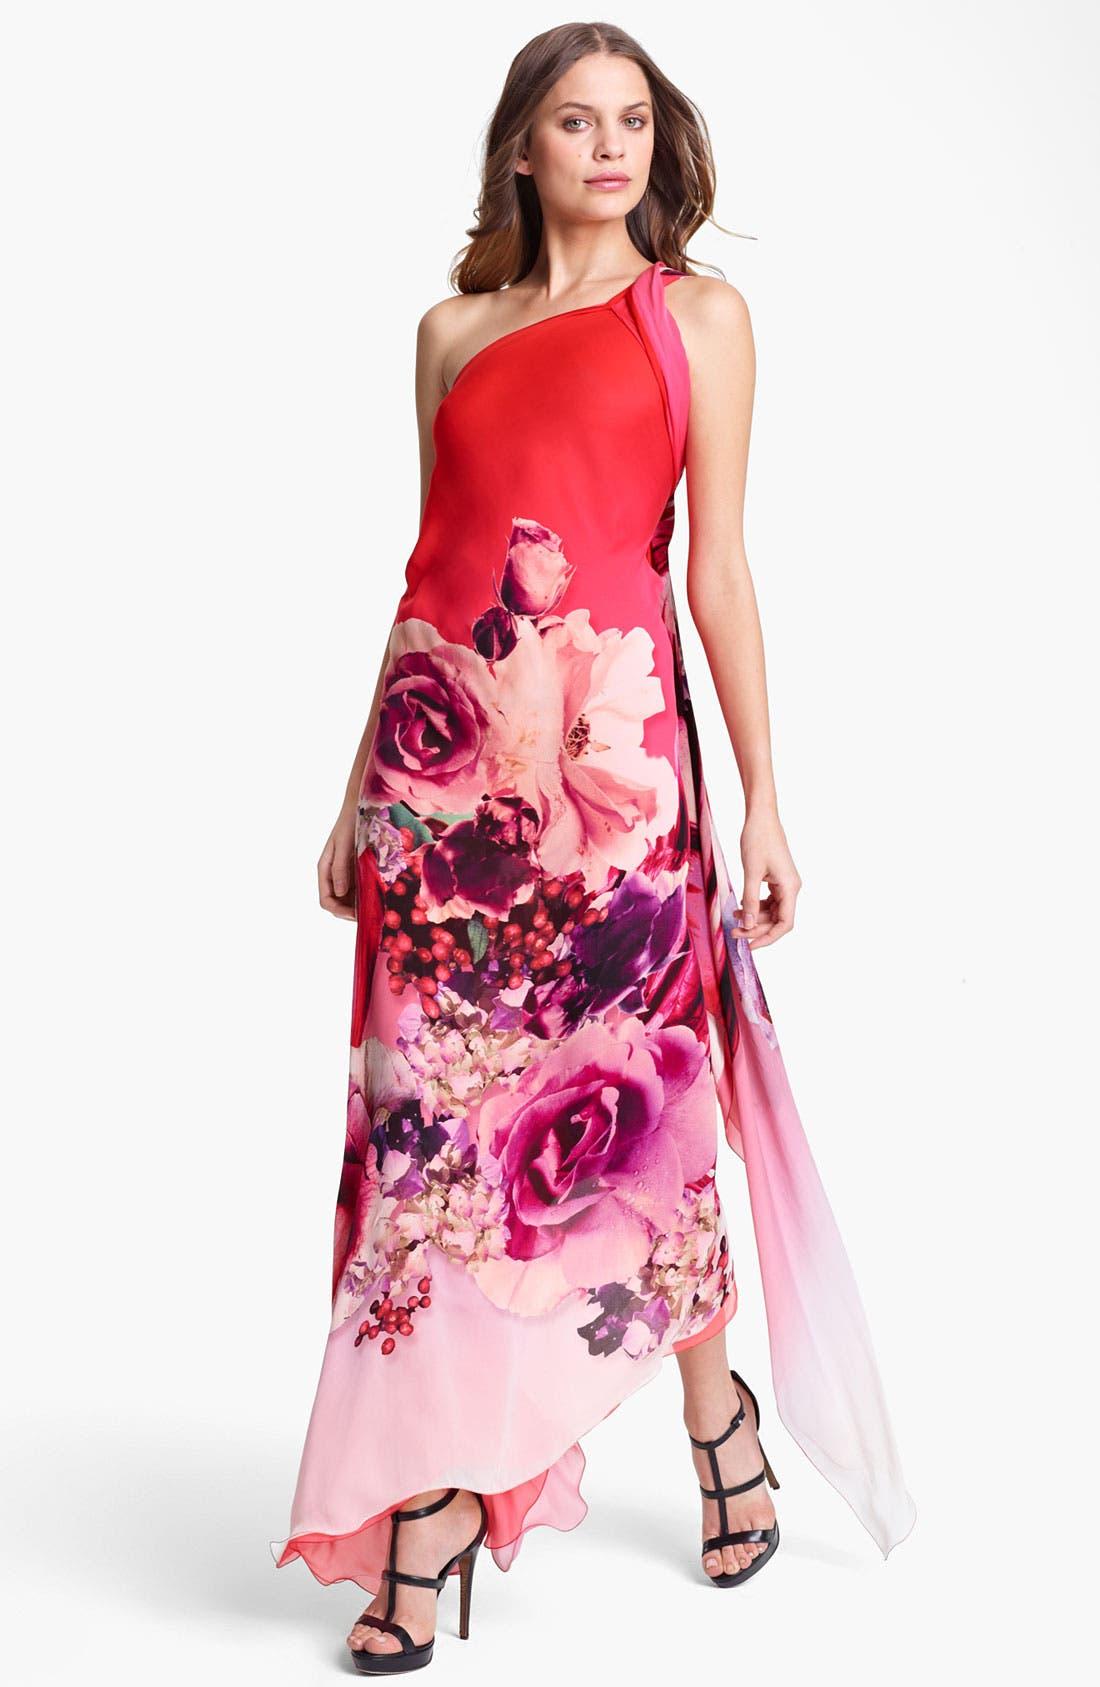 Main Image - Roberto Cavalli 'Veronique Print' One Shoulder Chiffon Gown